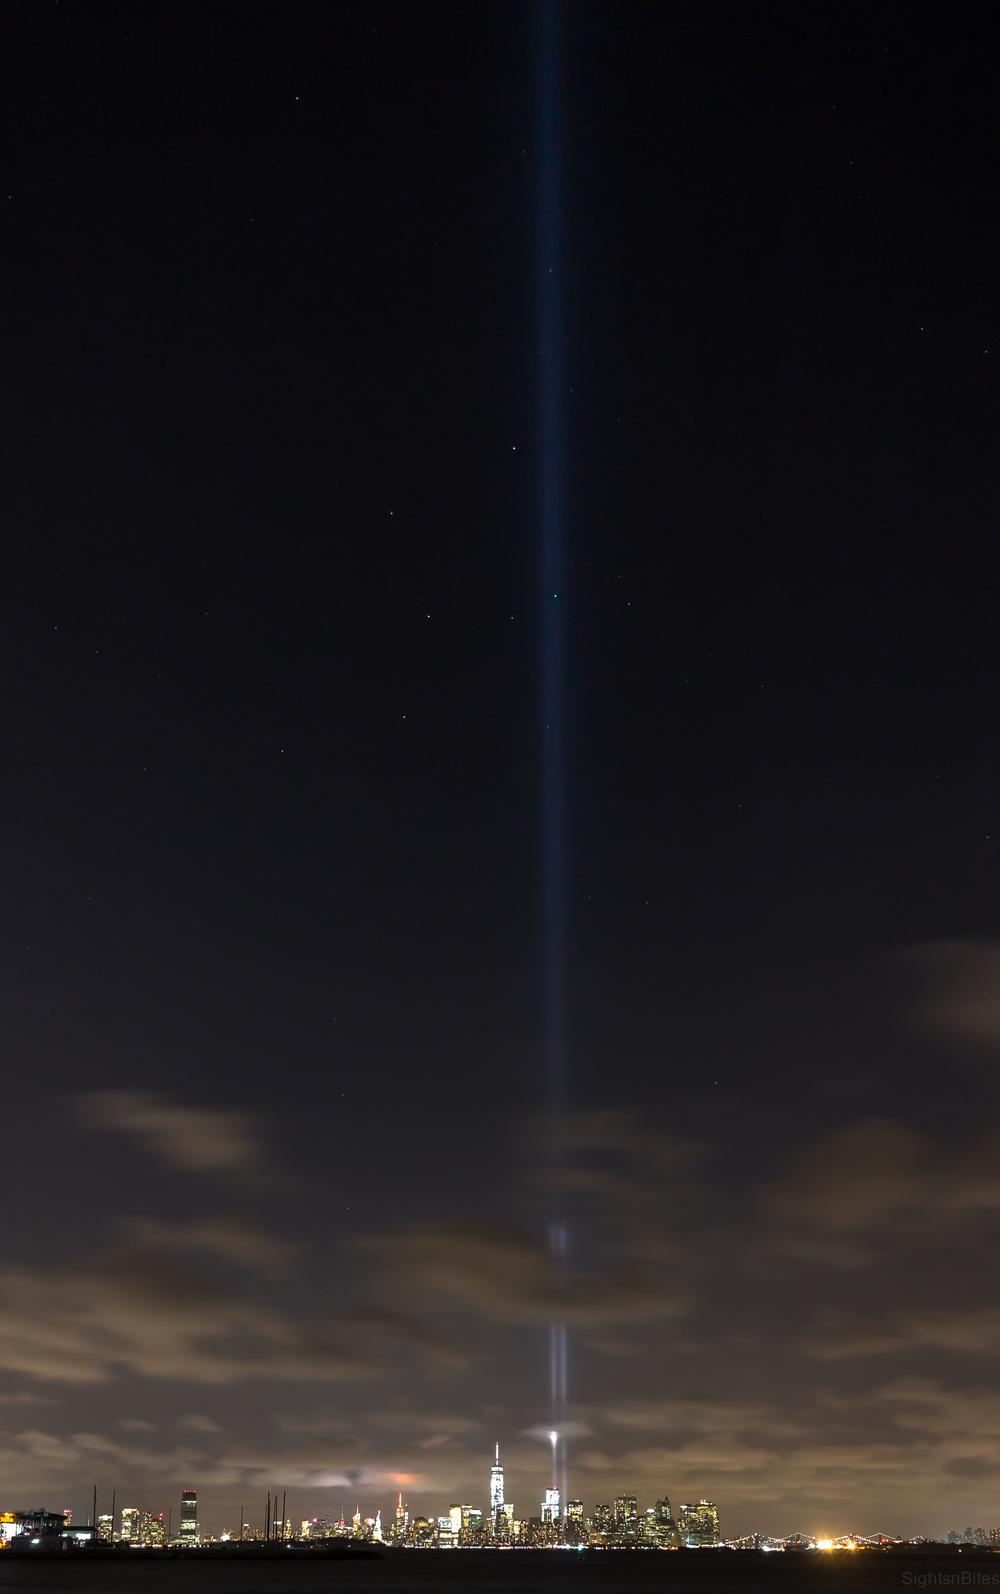 2014.09.10 || 205347 || Sights.jpg